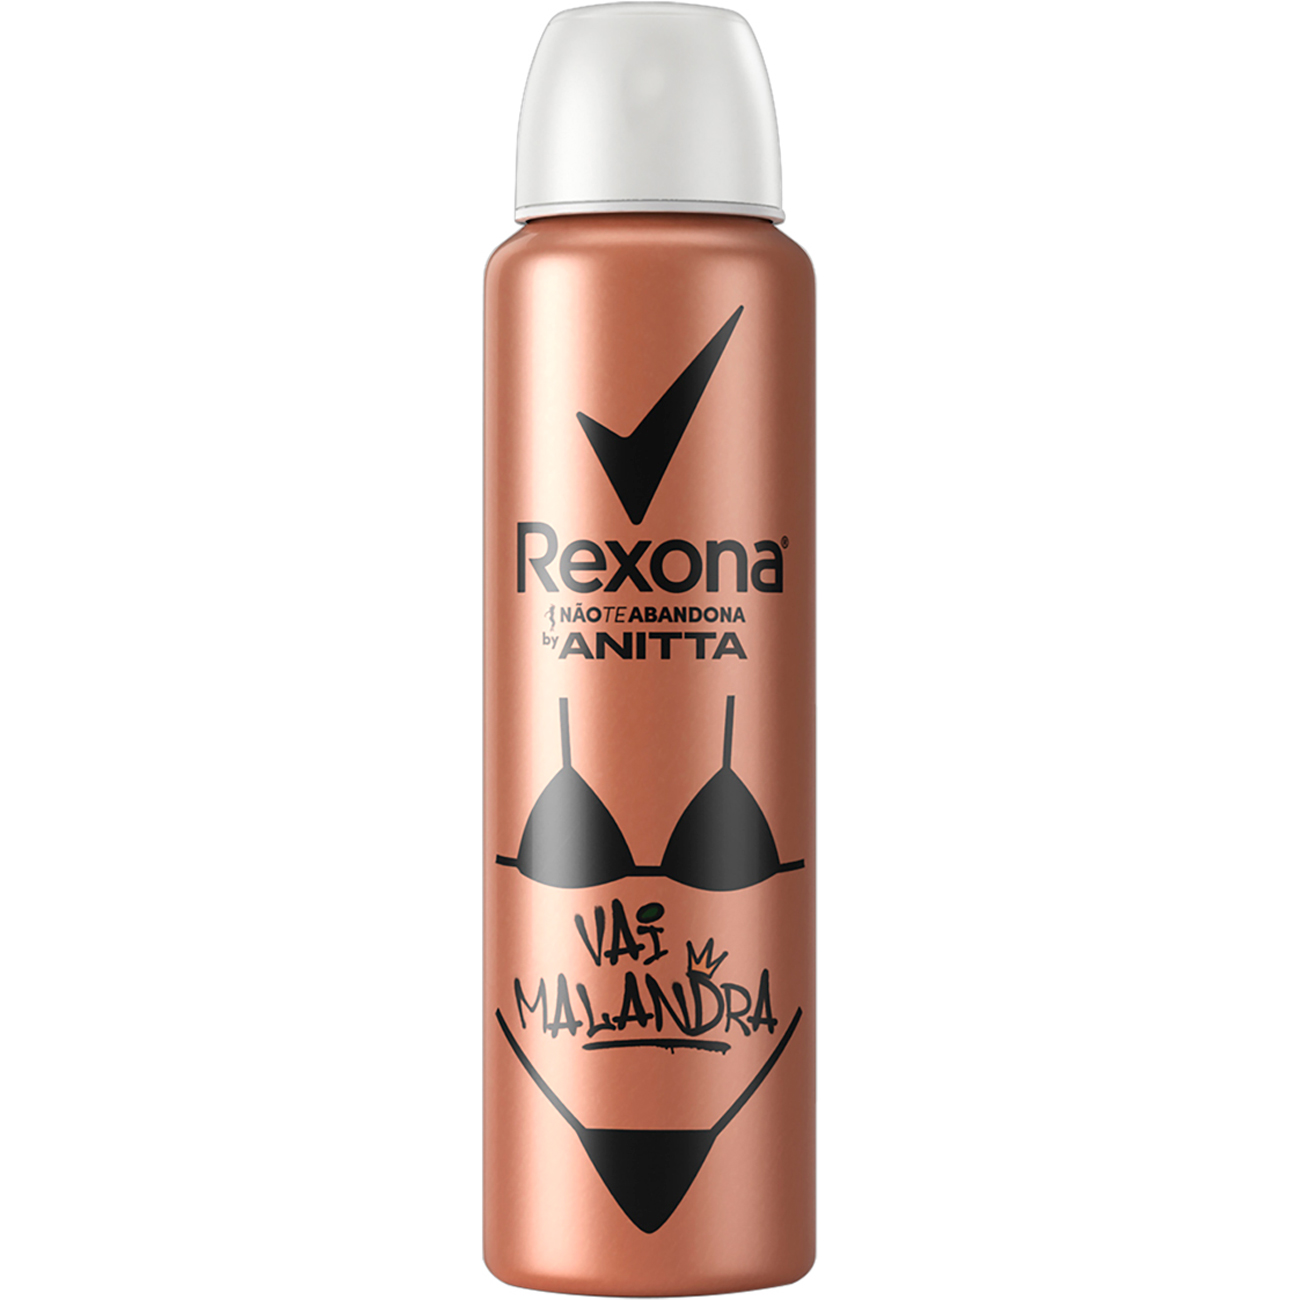 Desodorante Rexona Aerosol by Anitta Vai Malandra 150mL